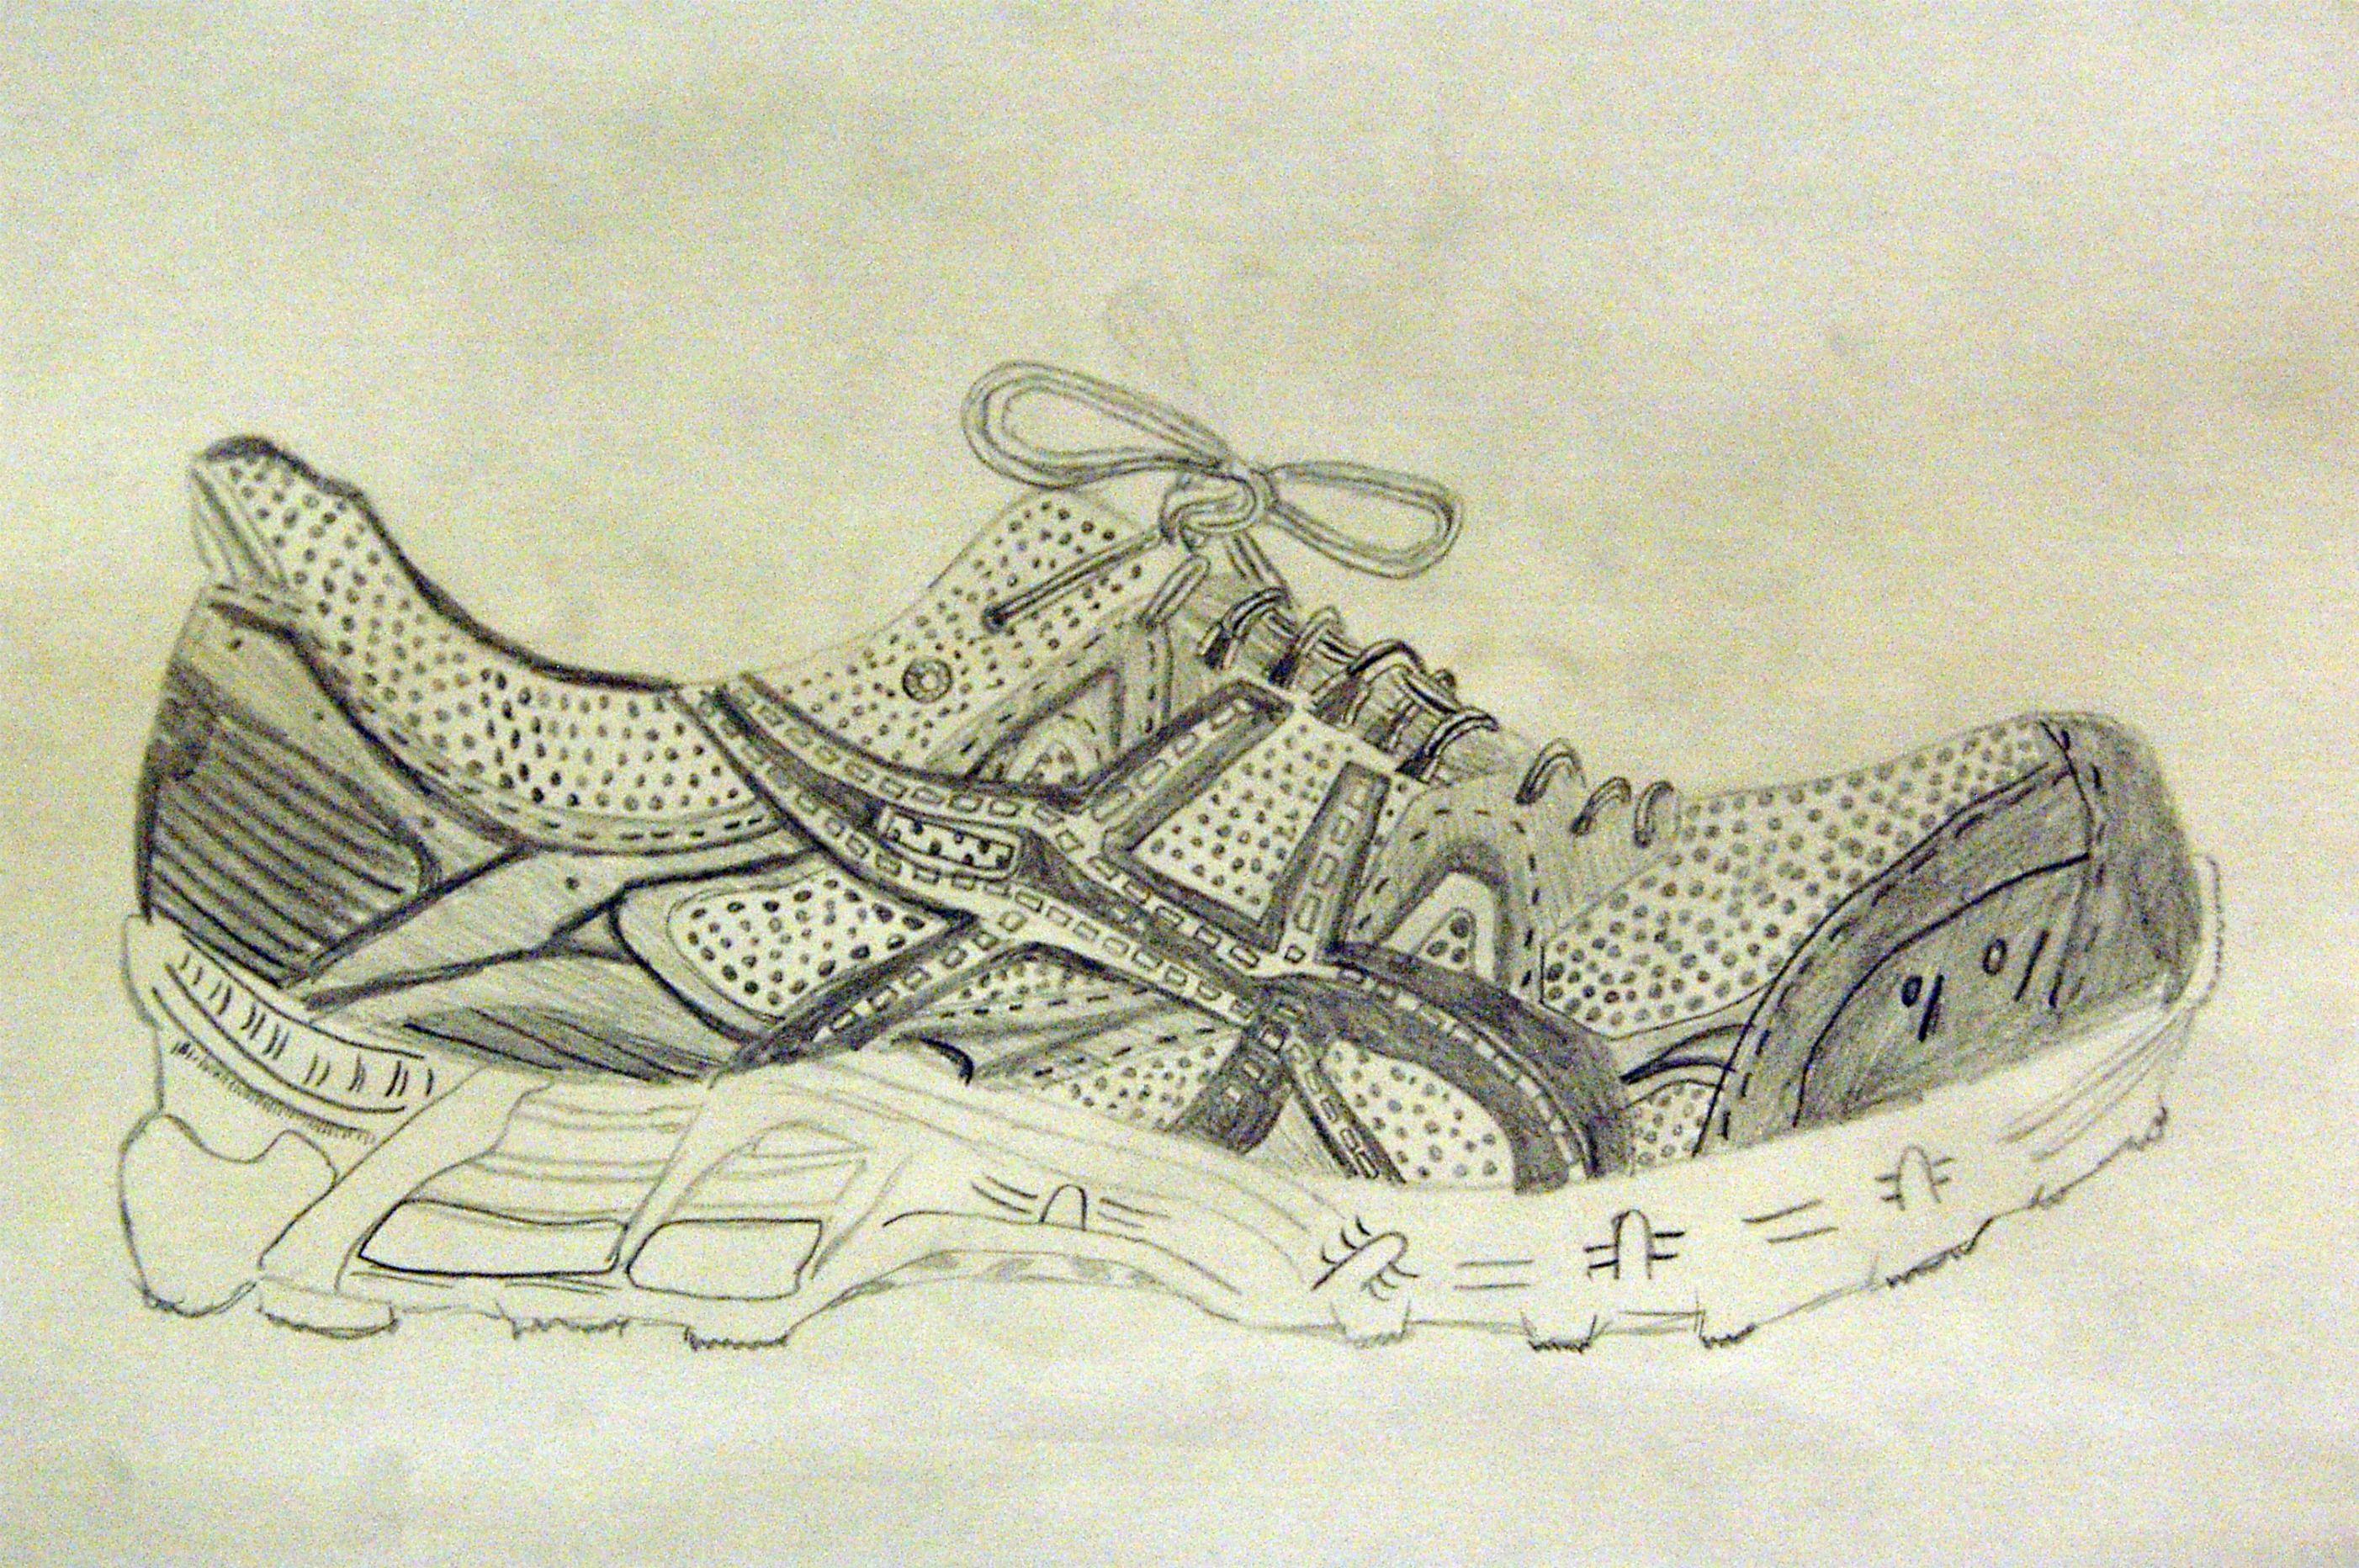 Contour Line Drawing Shoes Lesson Plan : 7th grade: shoe observation drawing art lesson ideas: shoes